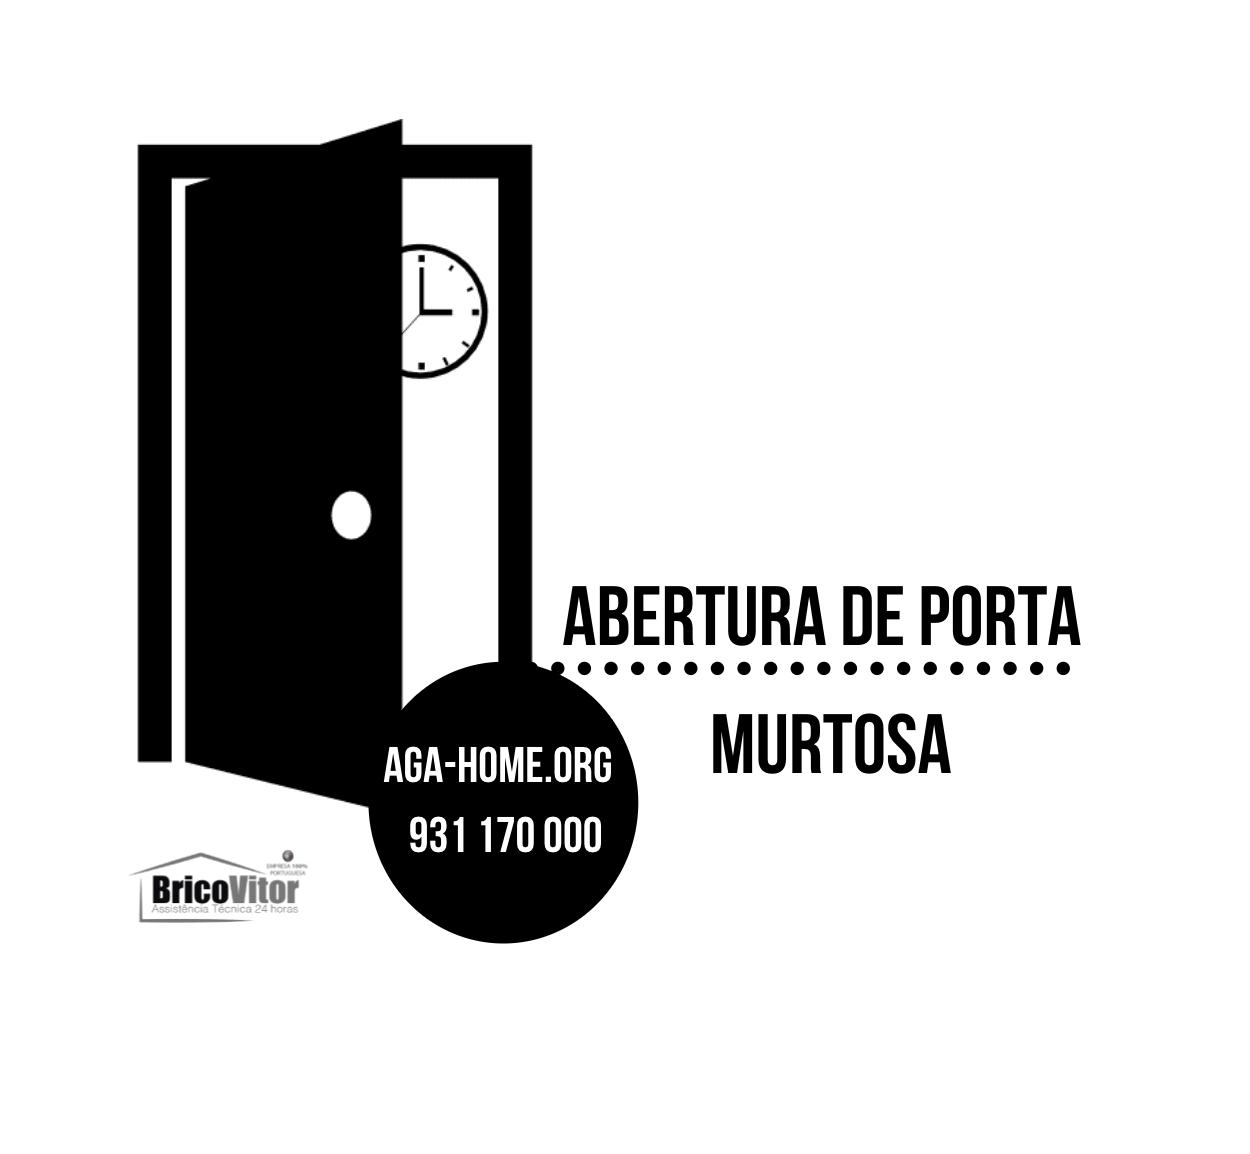 Abertura de Portas Murtosa